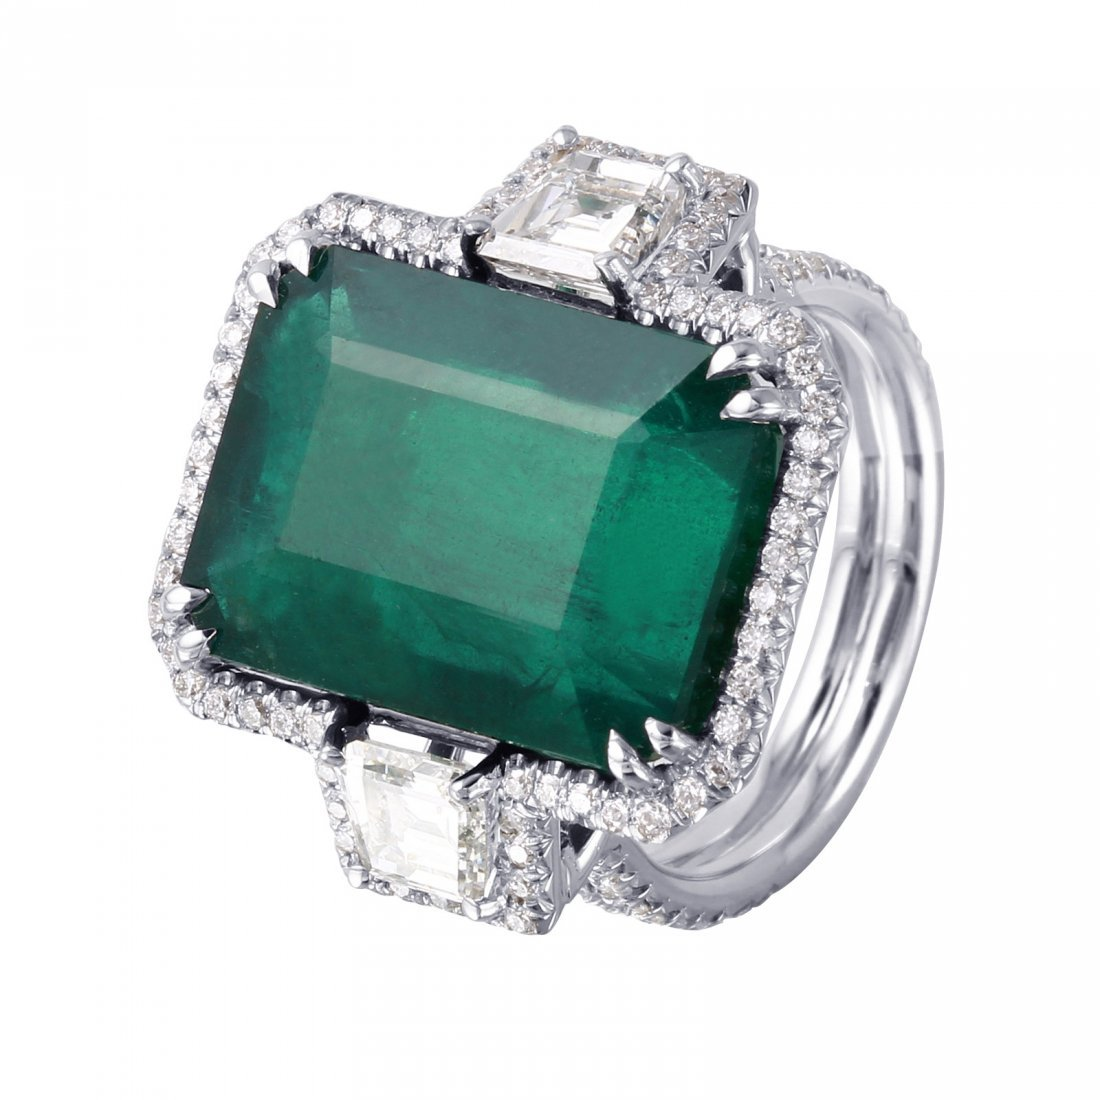 18KT White Gold Emerald & Diamond Ring